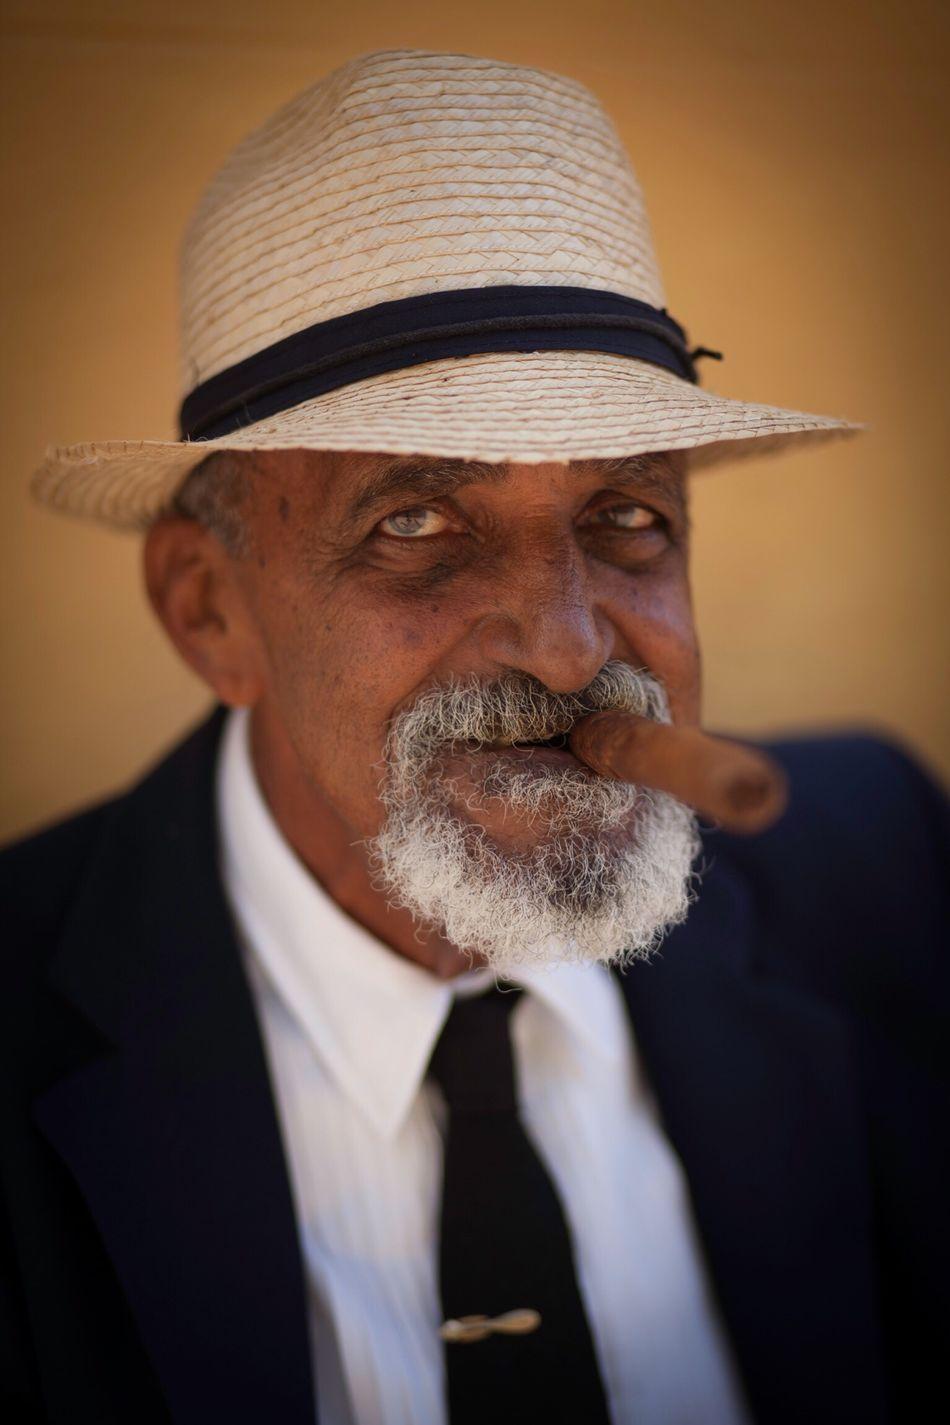 Potrait Cuban People Sigar Old Man Trinidad Up Close Street Photography Vacation Travel Holiday Havana Cuban Cuba People The Portraitist - 2016 EyeEm Awards